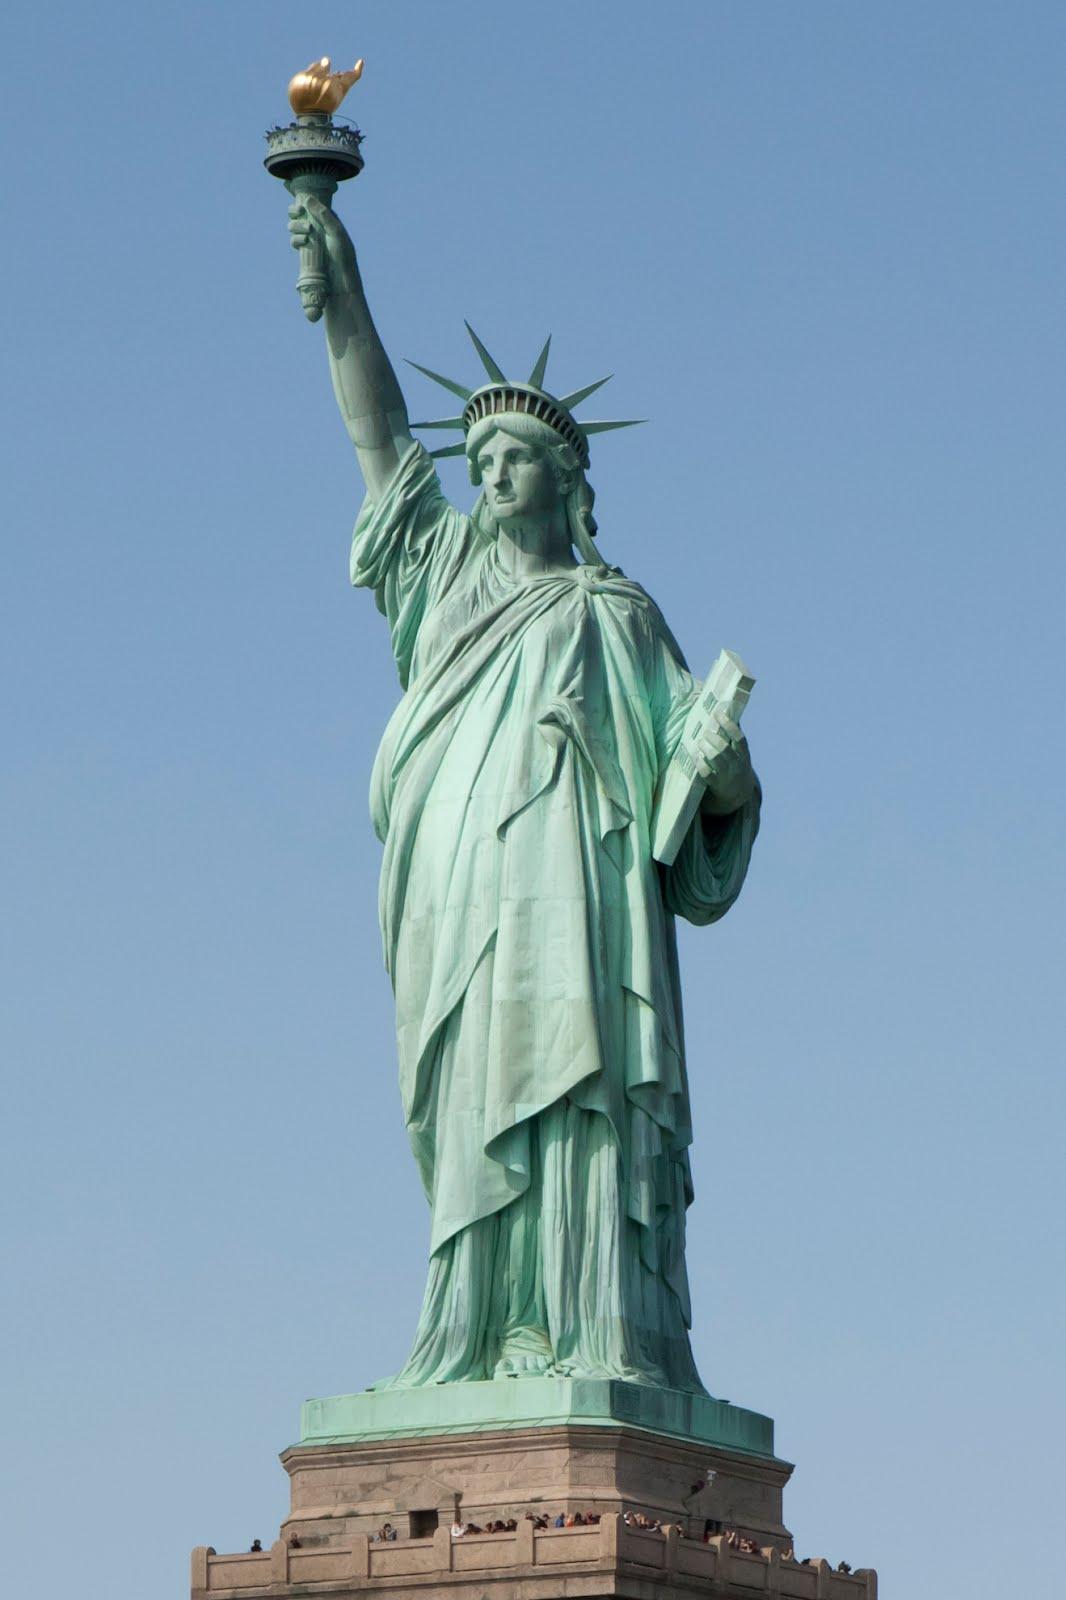 Hoy turismo 09 16 09 23 for Interior estatua de la libertad